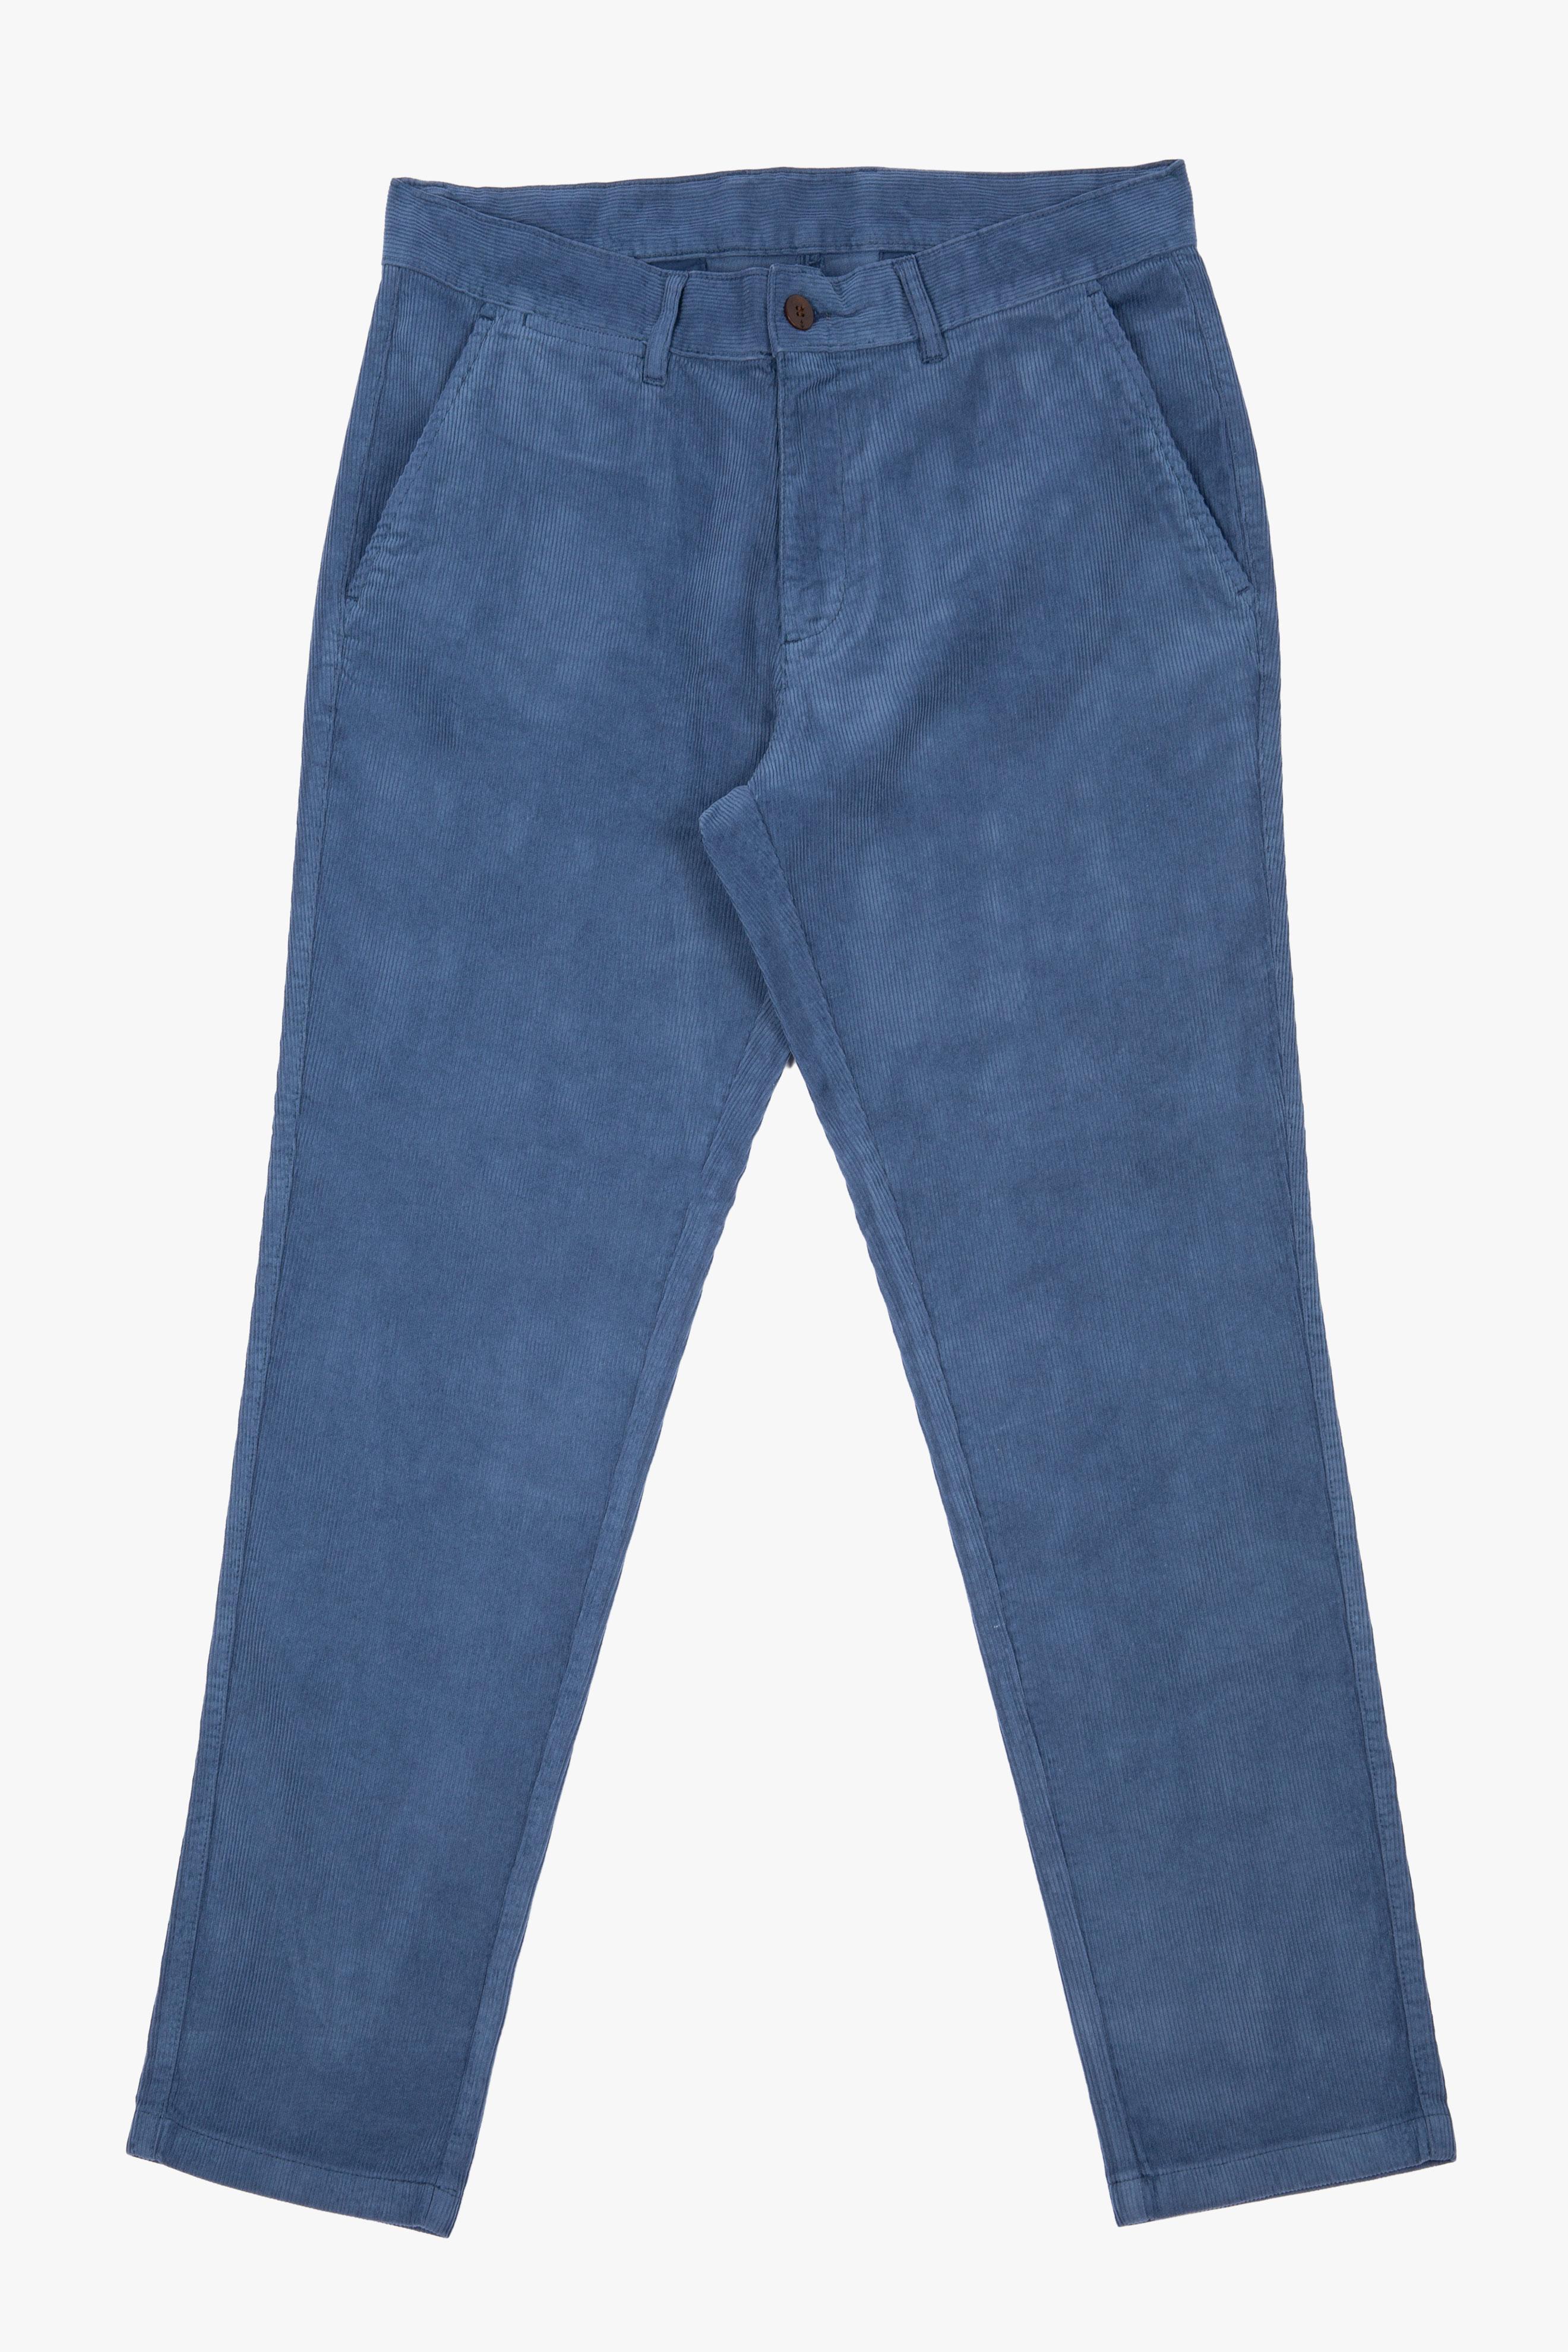 Cruz Trousers Blue